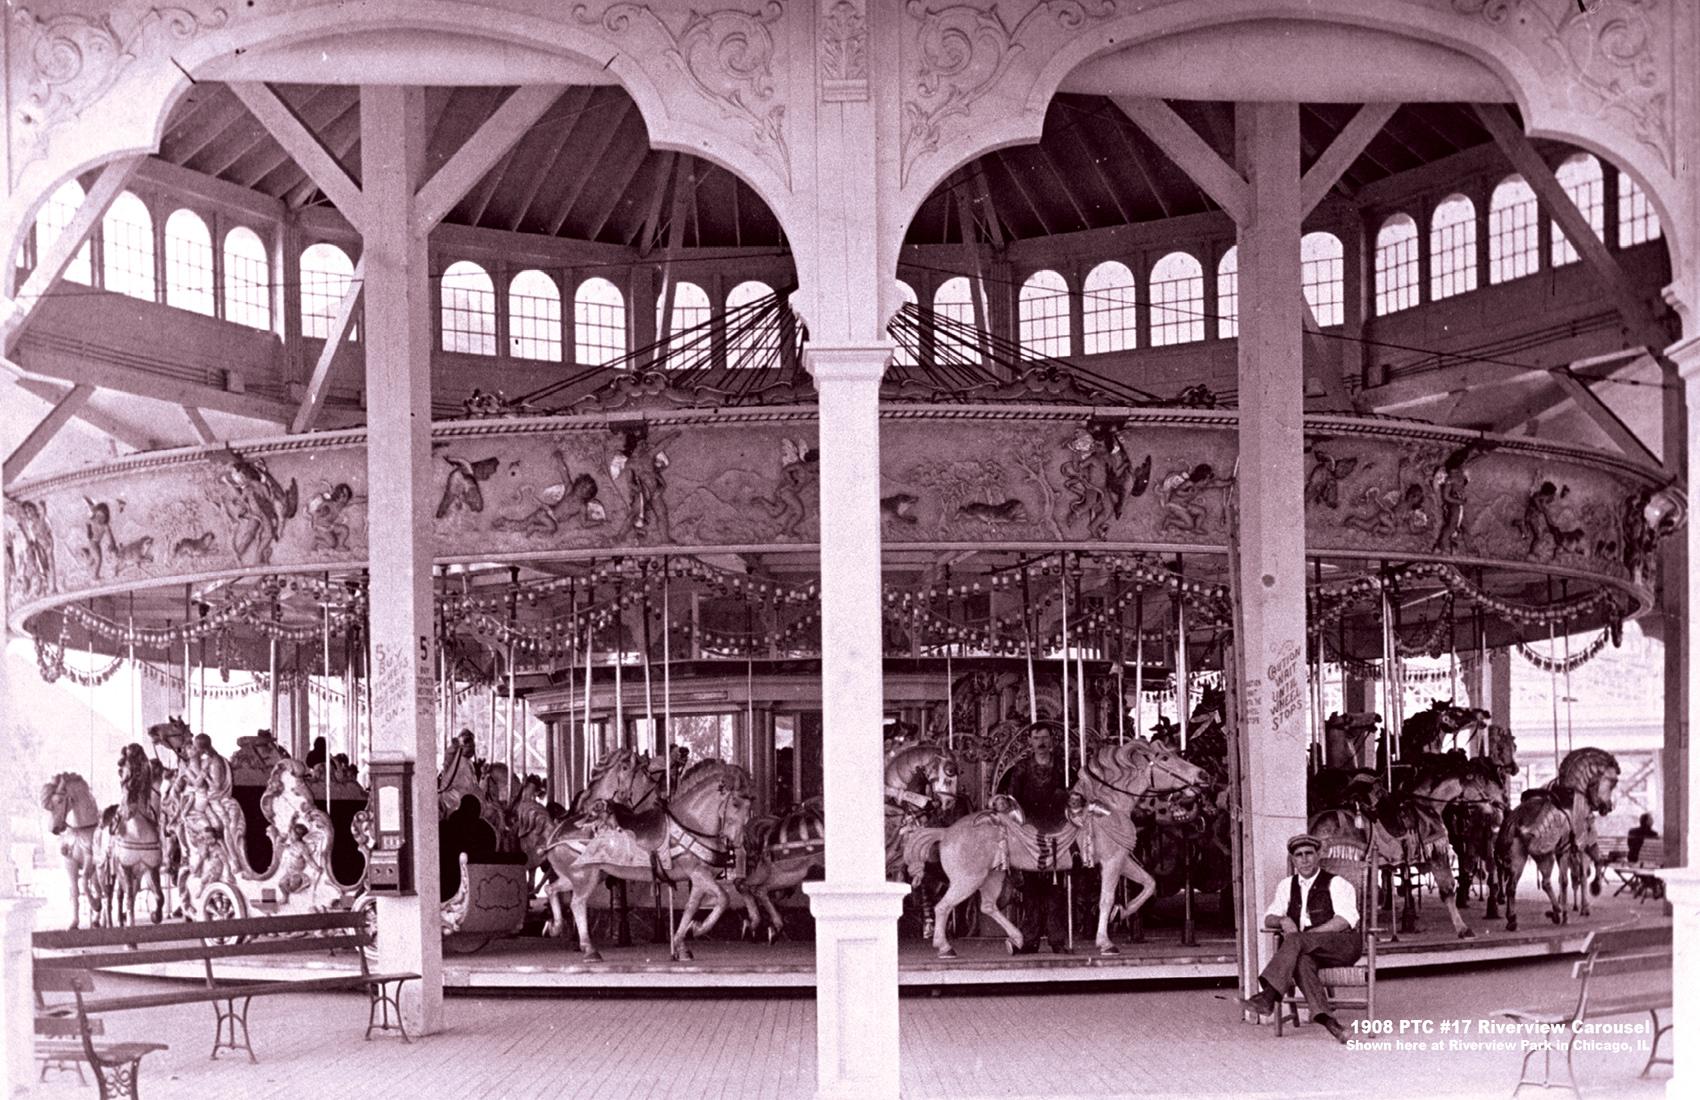 Historic-1908-PTC-17-Riverview-carousel-CNT-center-SEPT-08